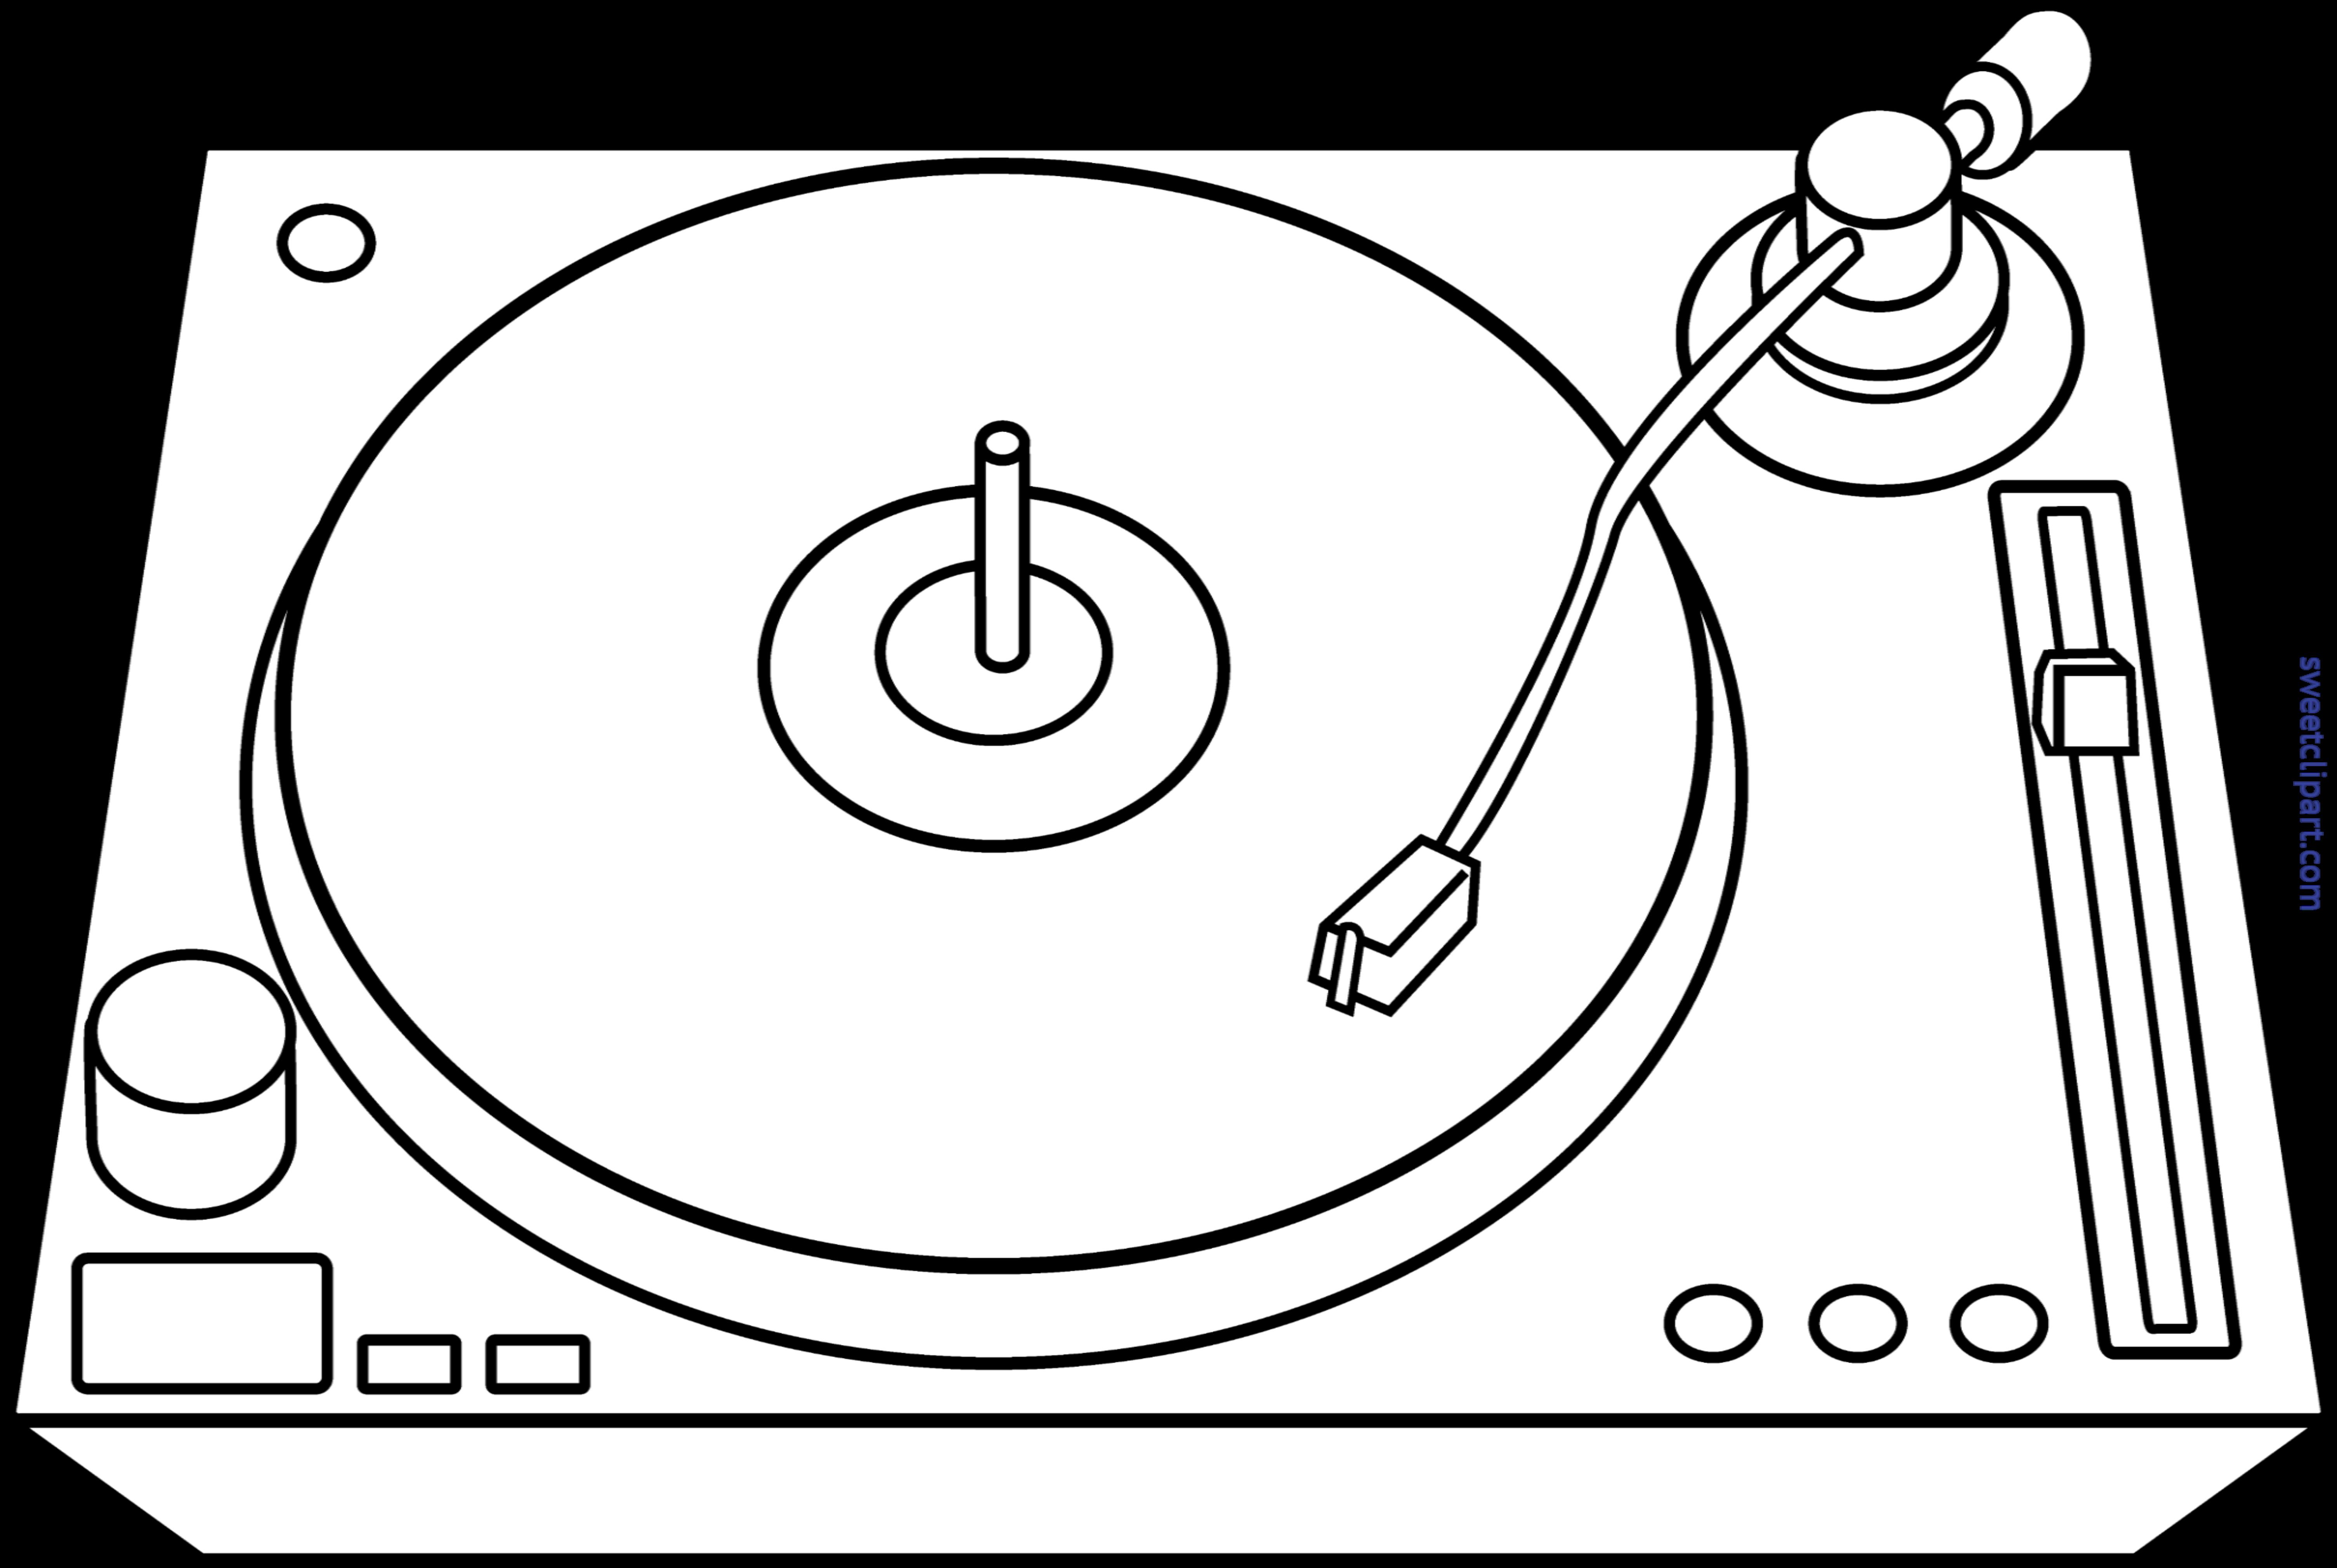 Turntable lineart clip art. Dj clipart dj mix